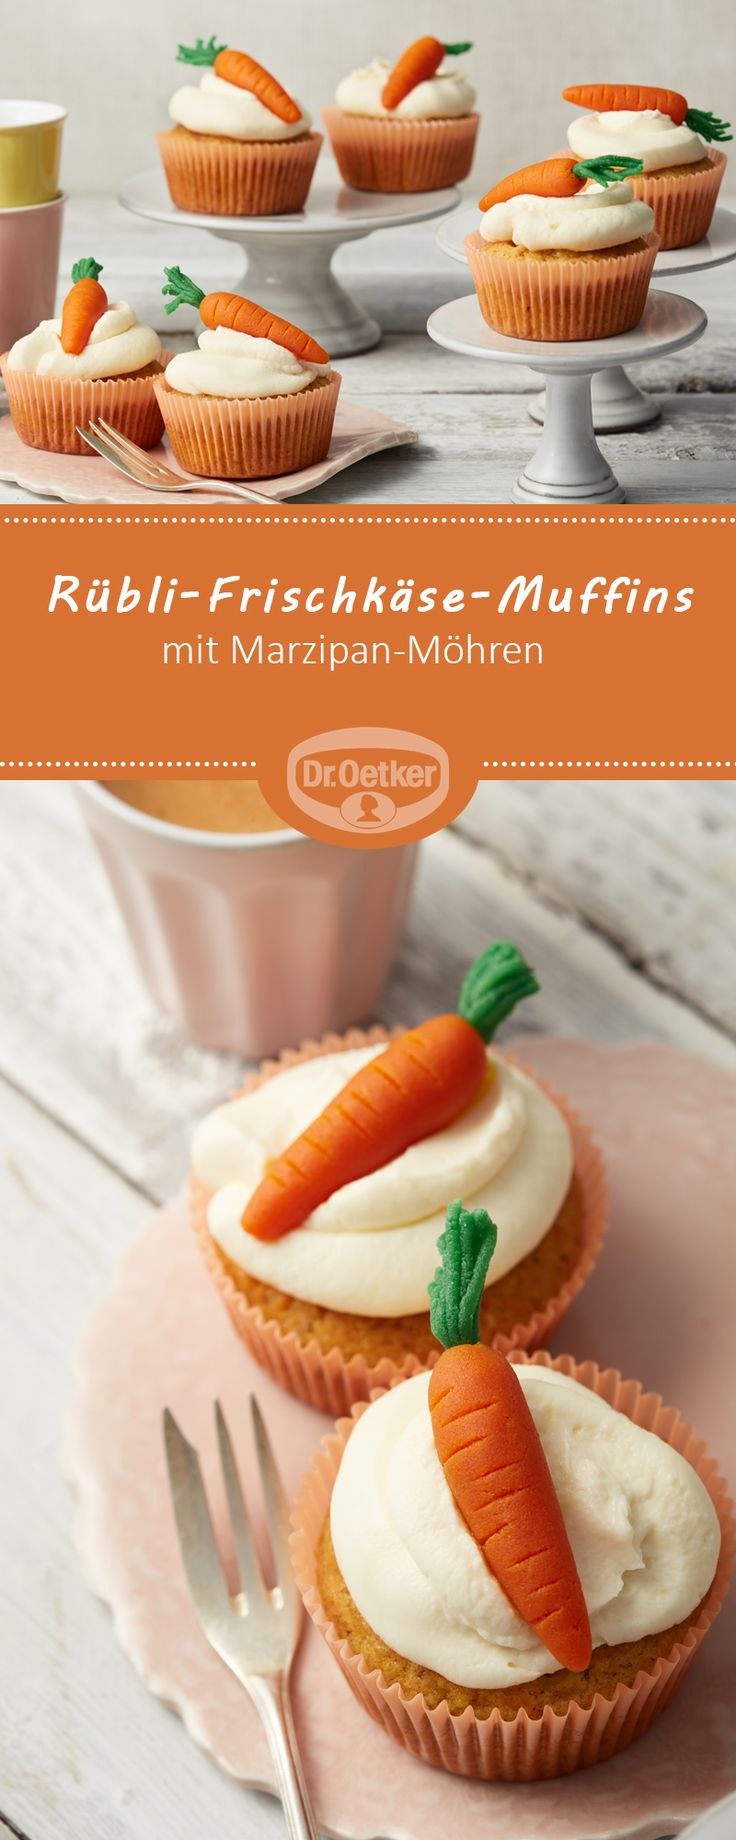 Rübli-Frischkäse-Cupcakes - Beliebte Cupcakes mit Marzipan-Möhren und Frischkäse-Topping #ostern #rezept #lecker